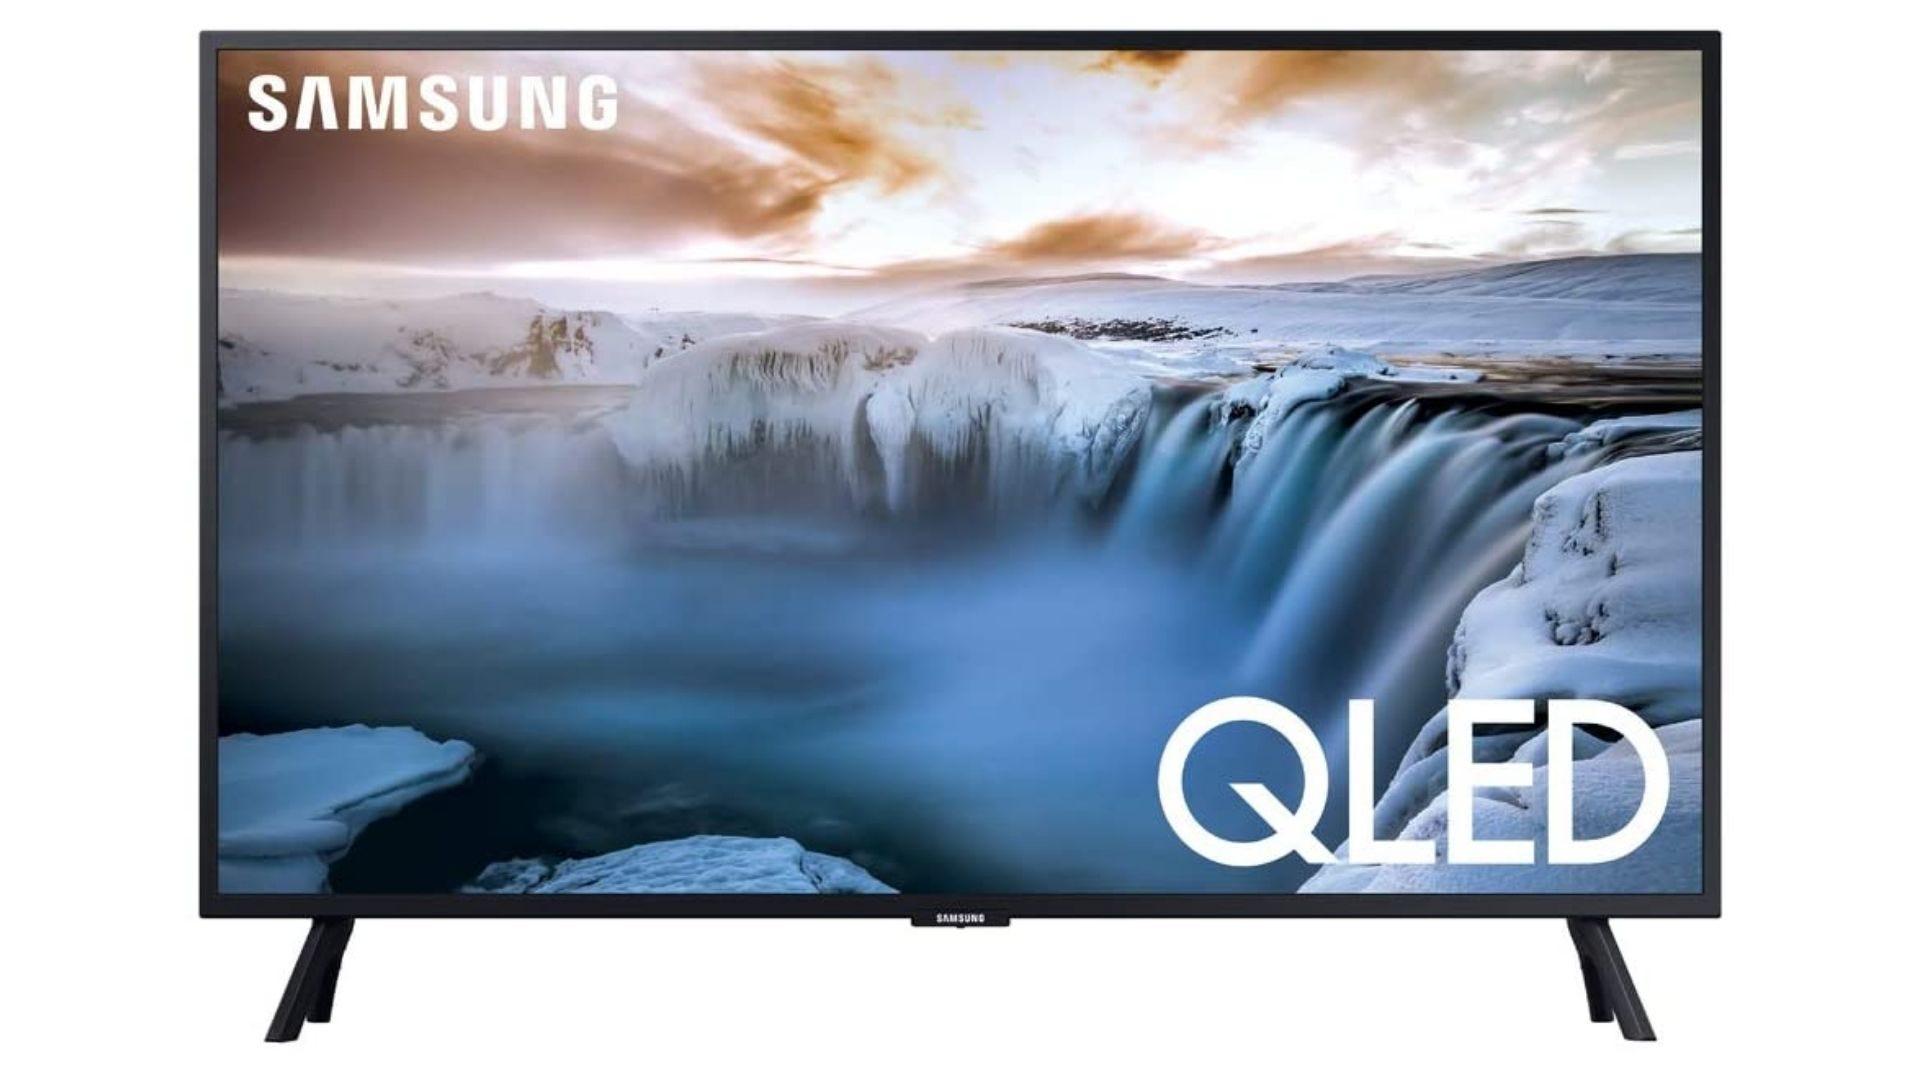 SAMSUNG QN32Q50RAFXZA Flat 32 QLED 4K Seria 32Q50 Smart TV (model 2019)